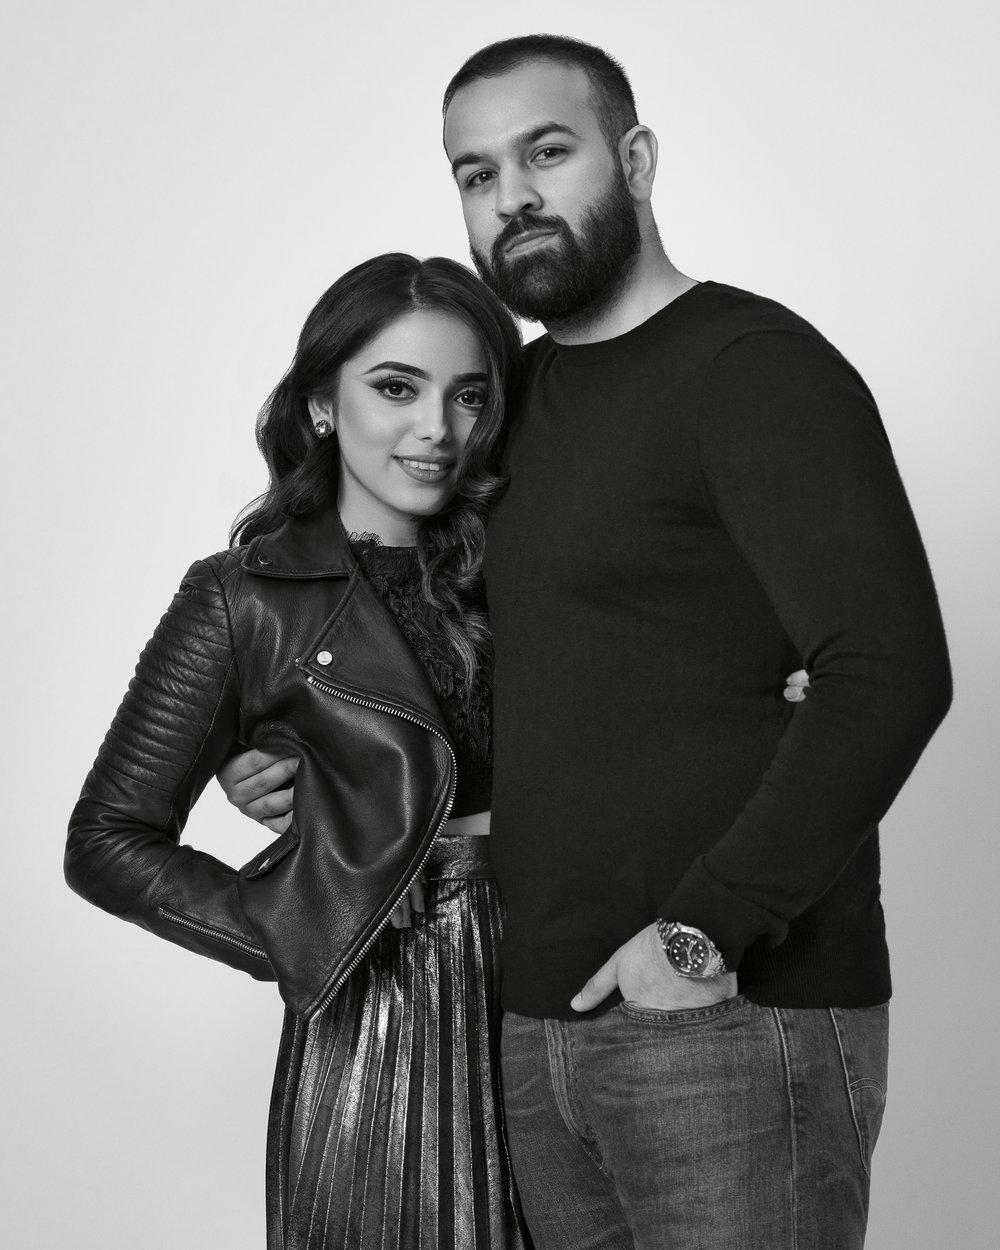 corporate business headshots portrait acting professional photography photographer toronto studio couple engagement